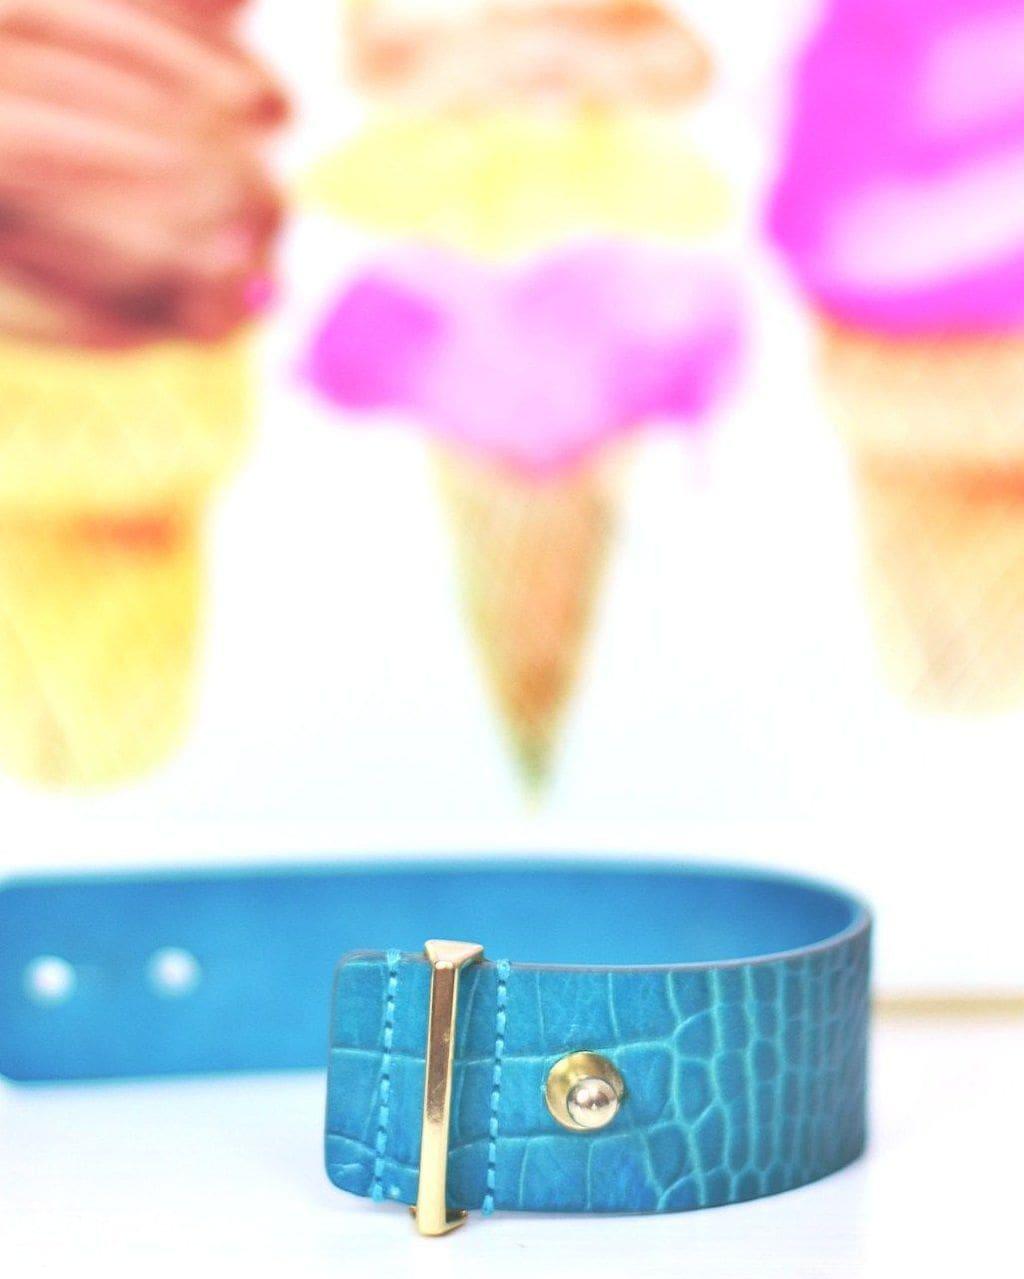 cuff-bracelet-trendy-2018.jpg